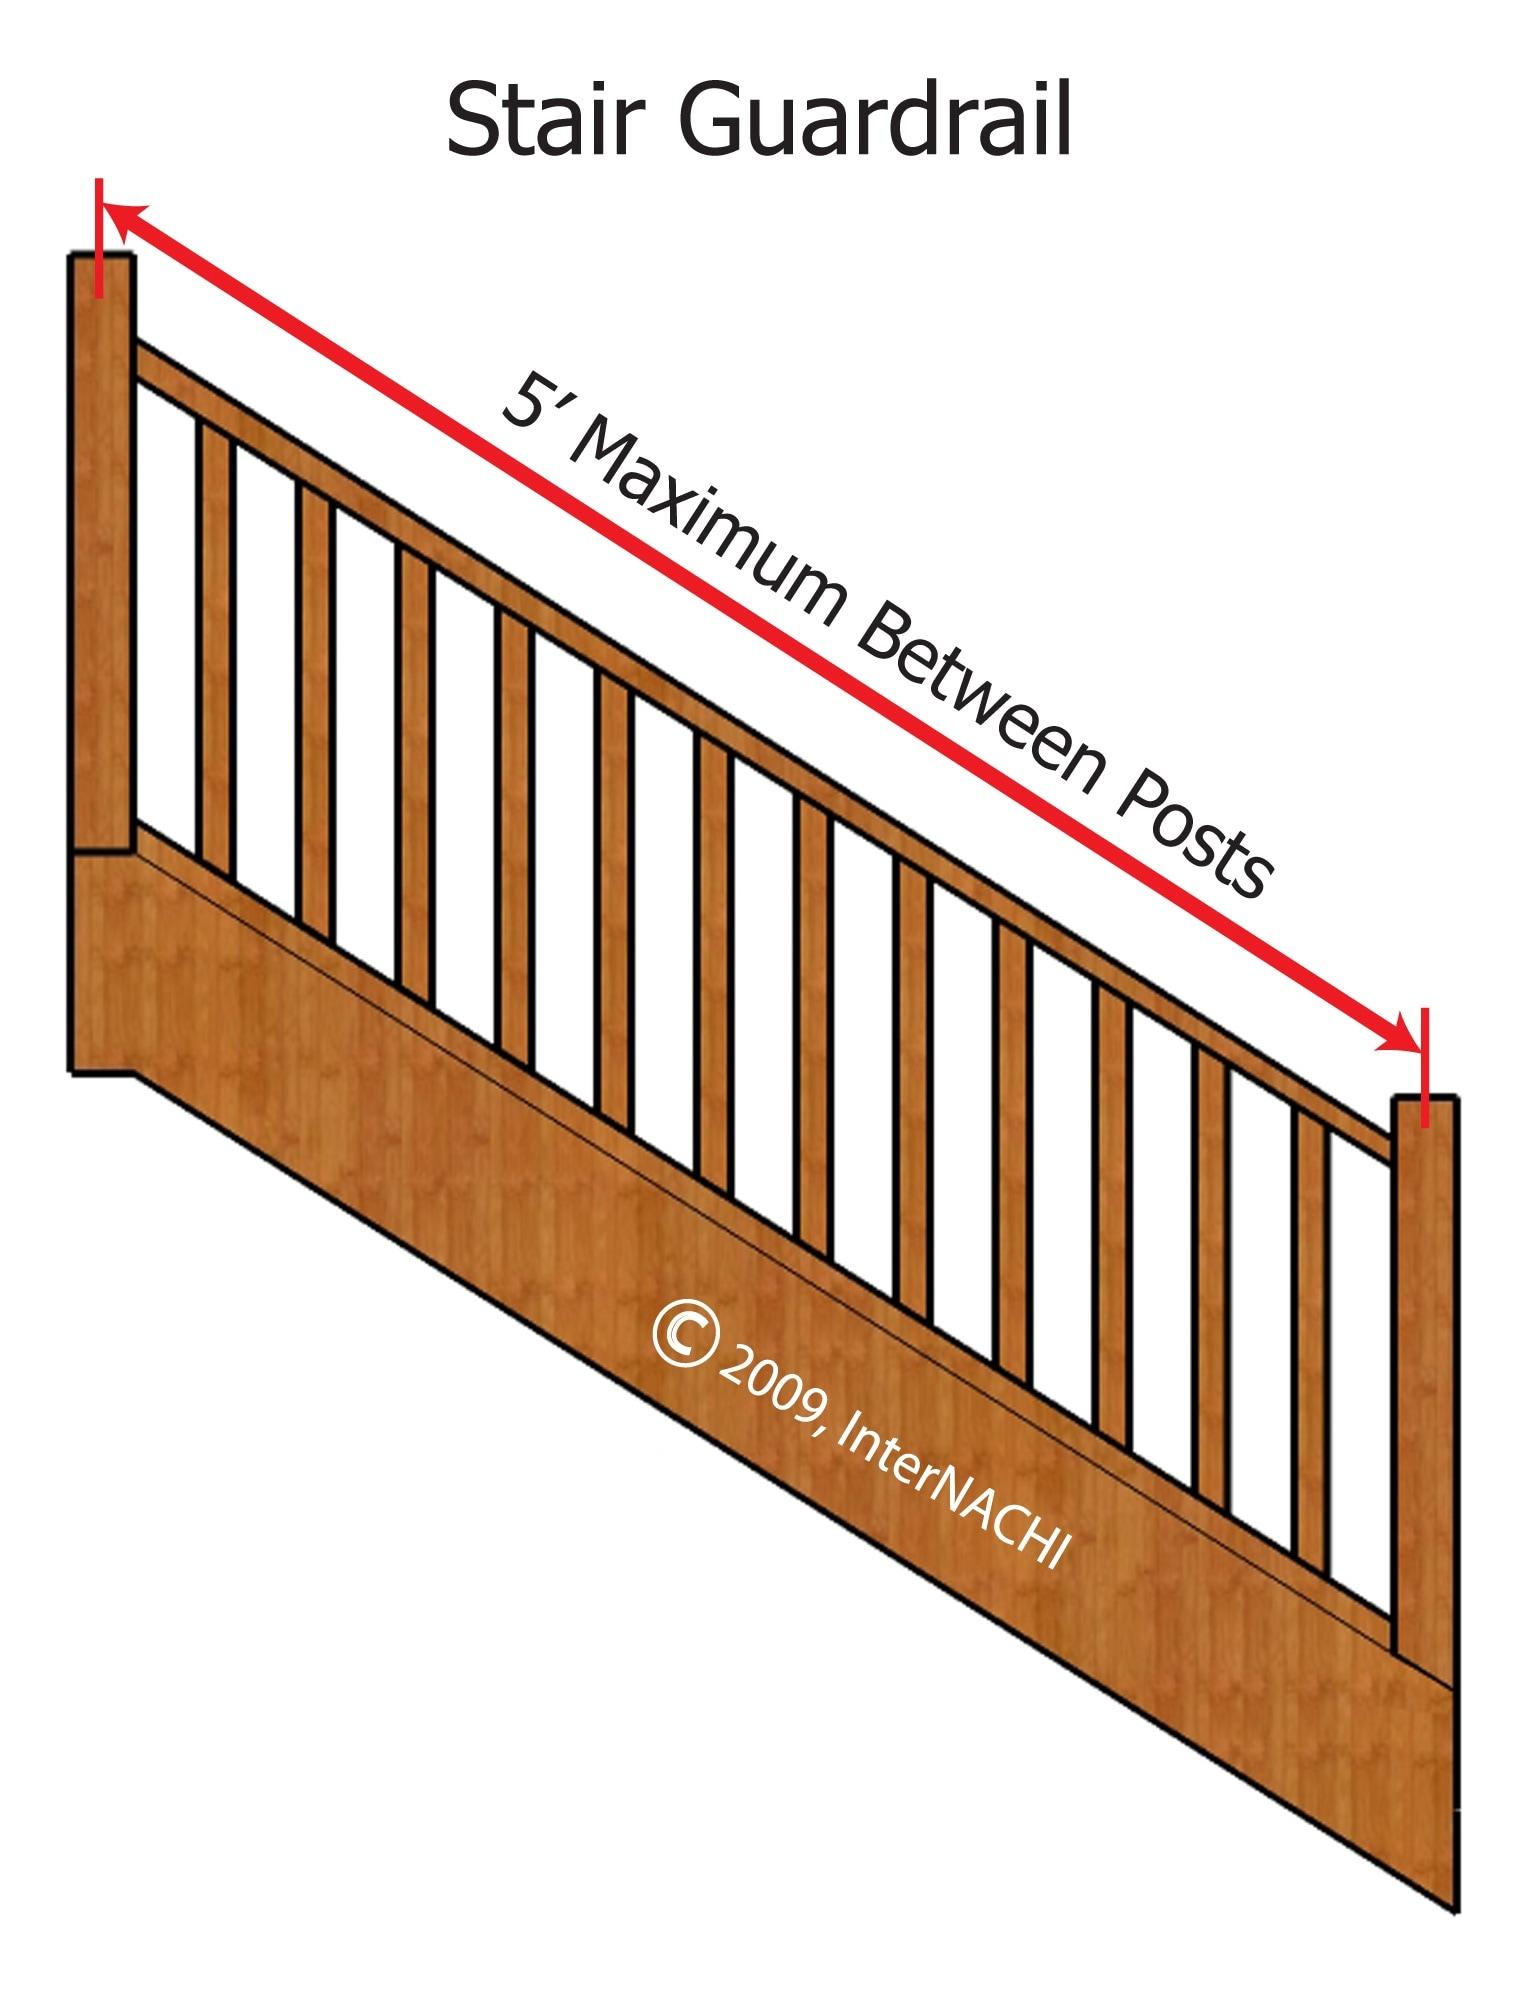 Maximum distance between handrail posts.